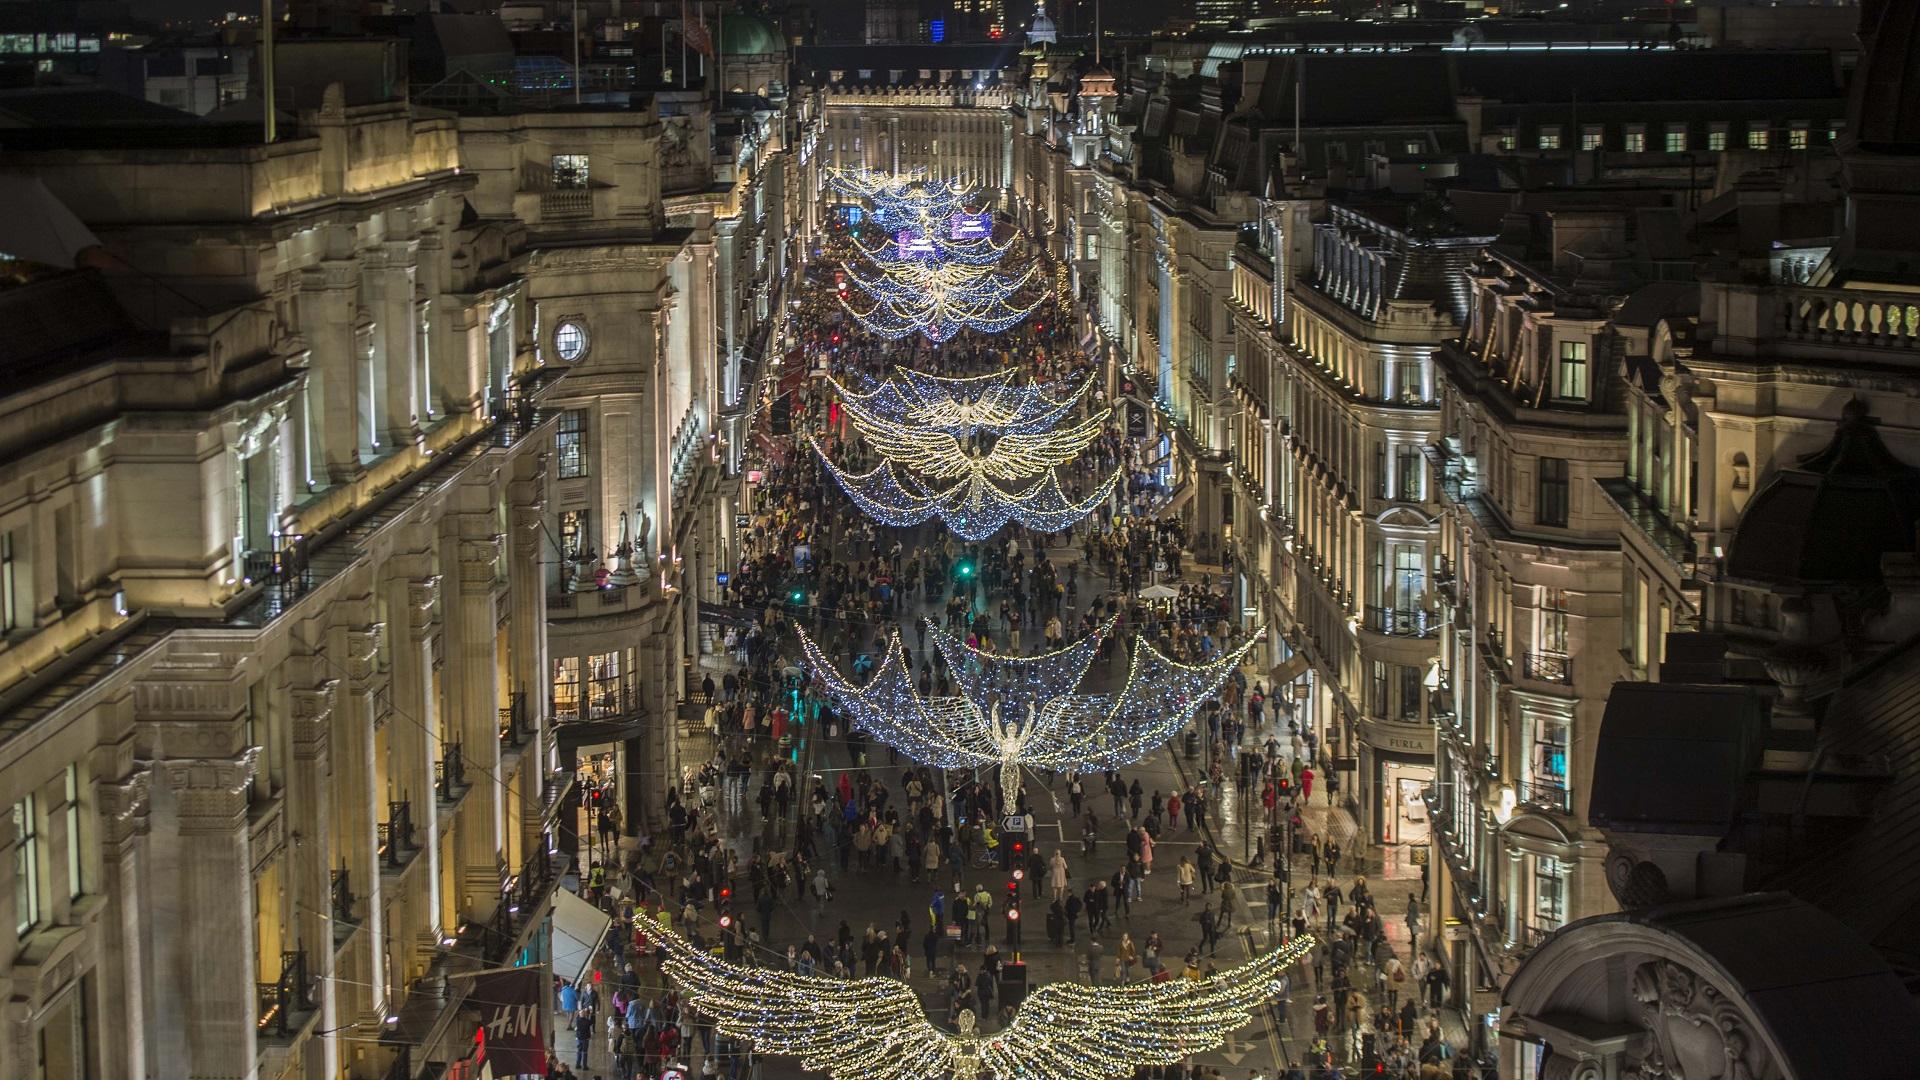 Regent Street Christmas Lights